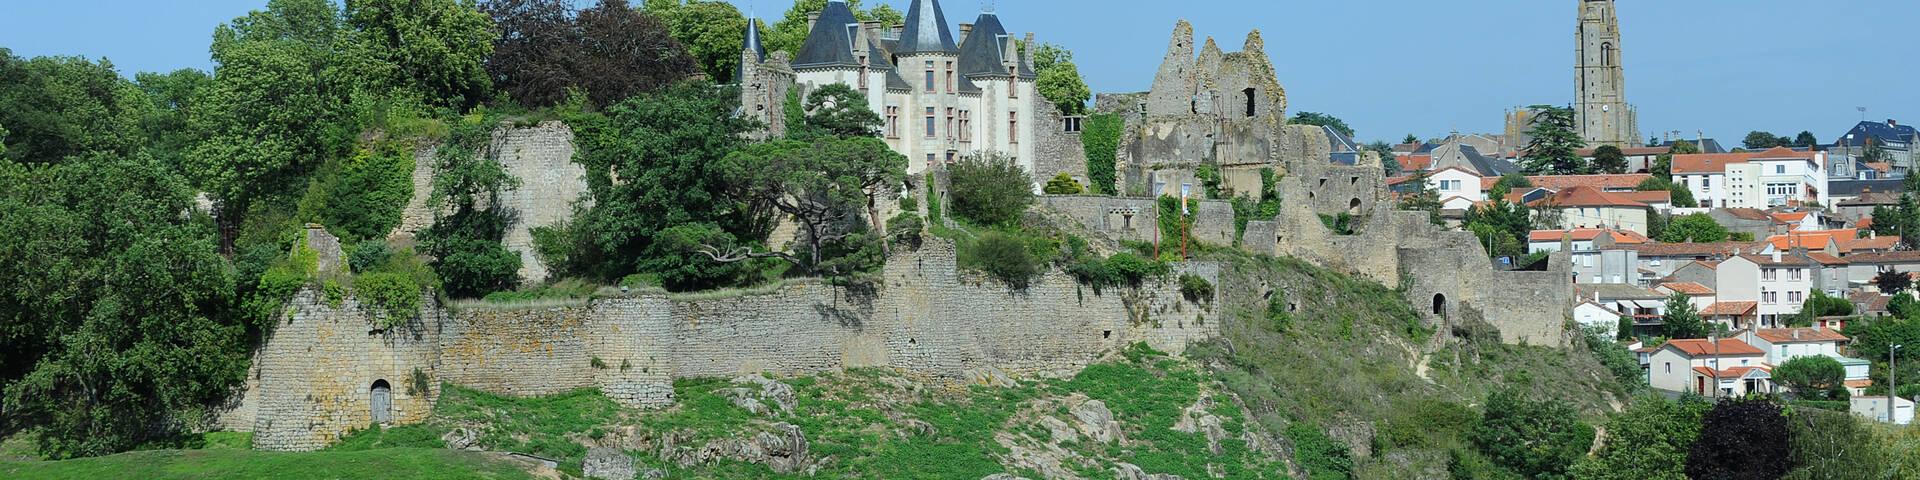 Château de Bressuire @PWall/CD79